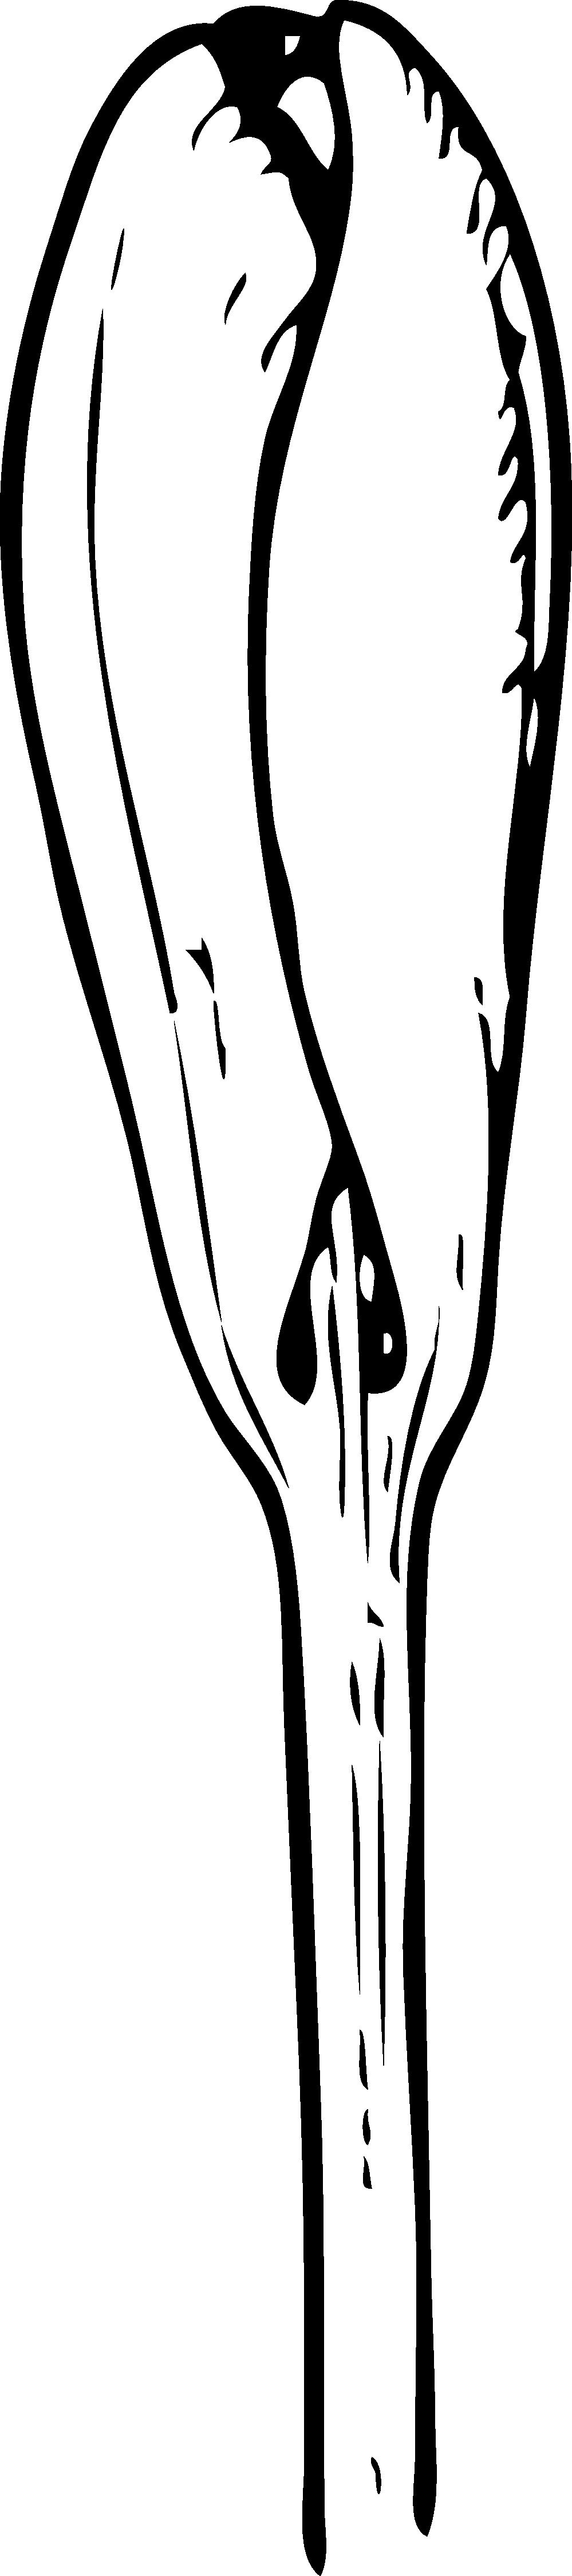 Zucchini clipart black and white. Images zipper